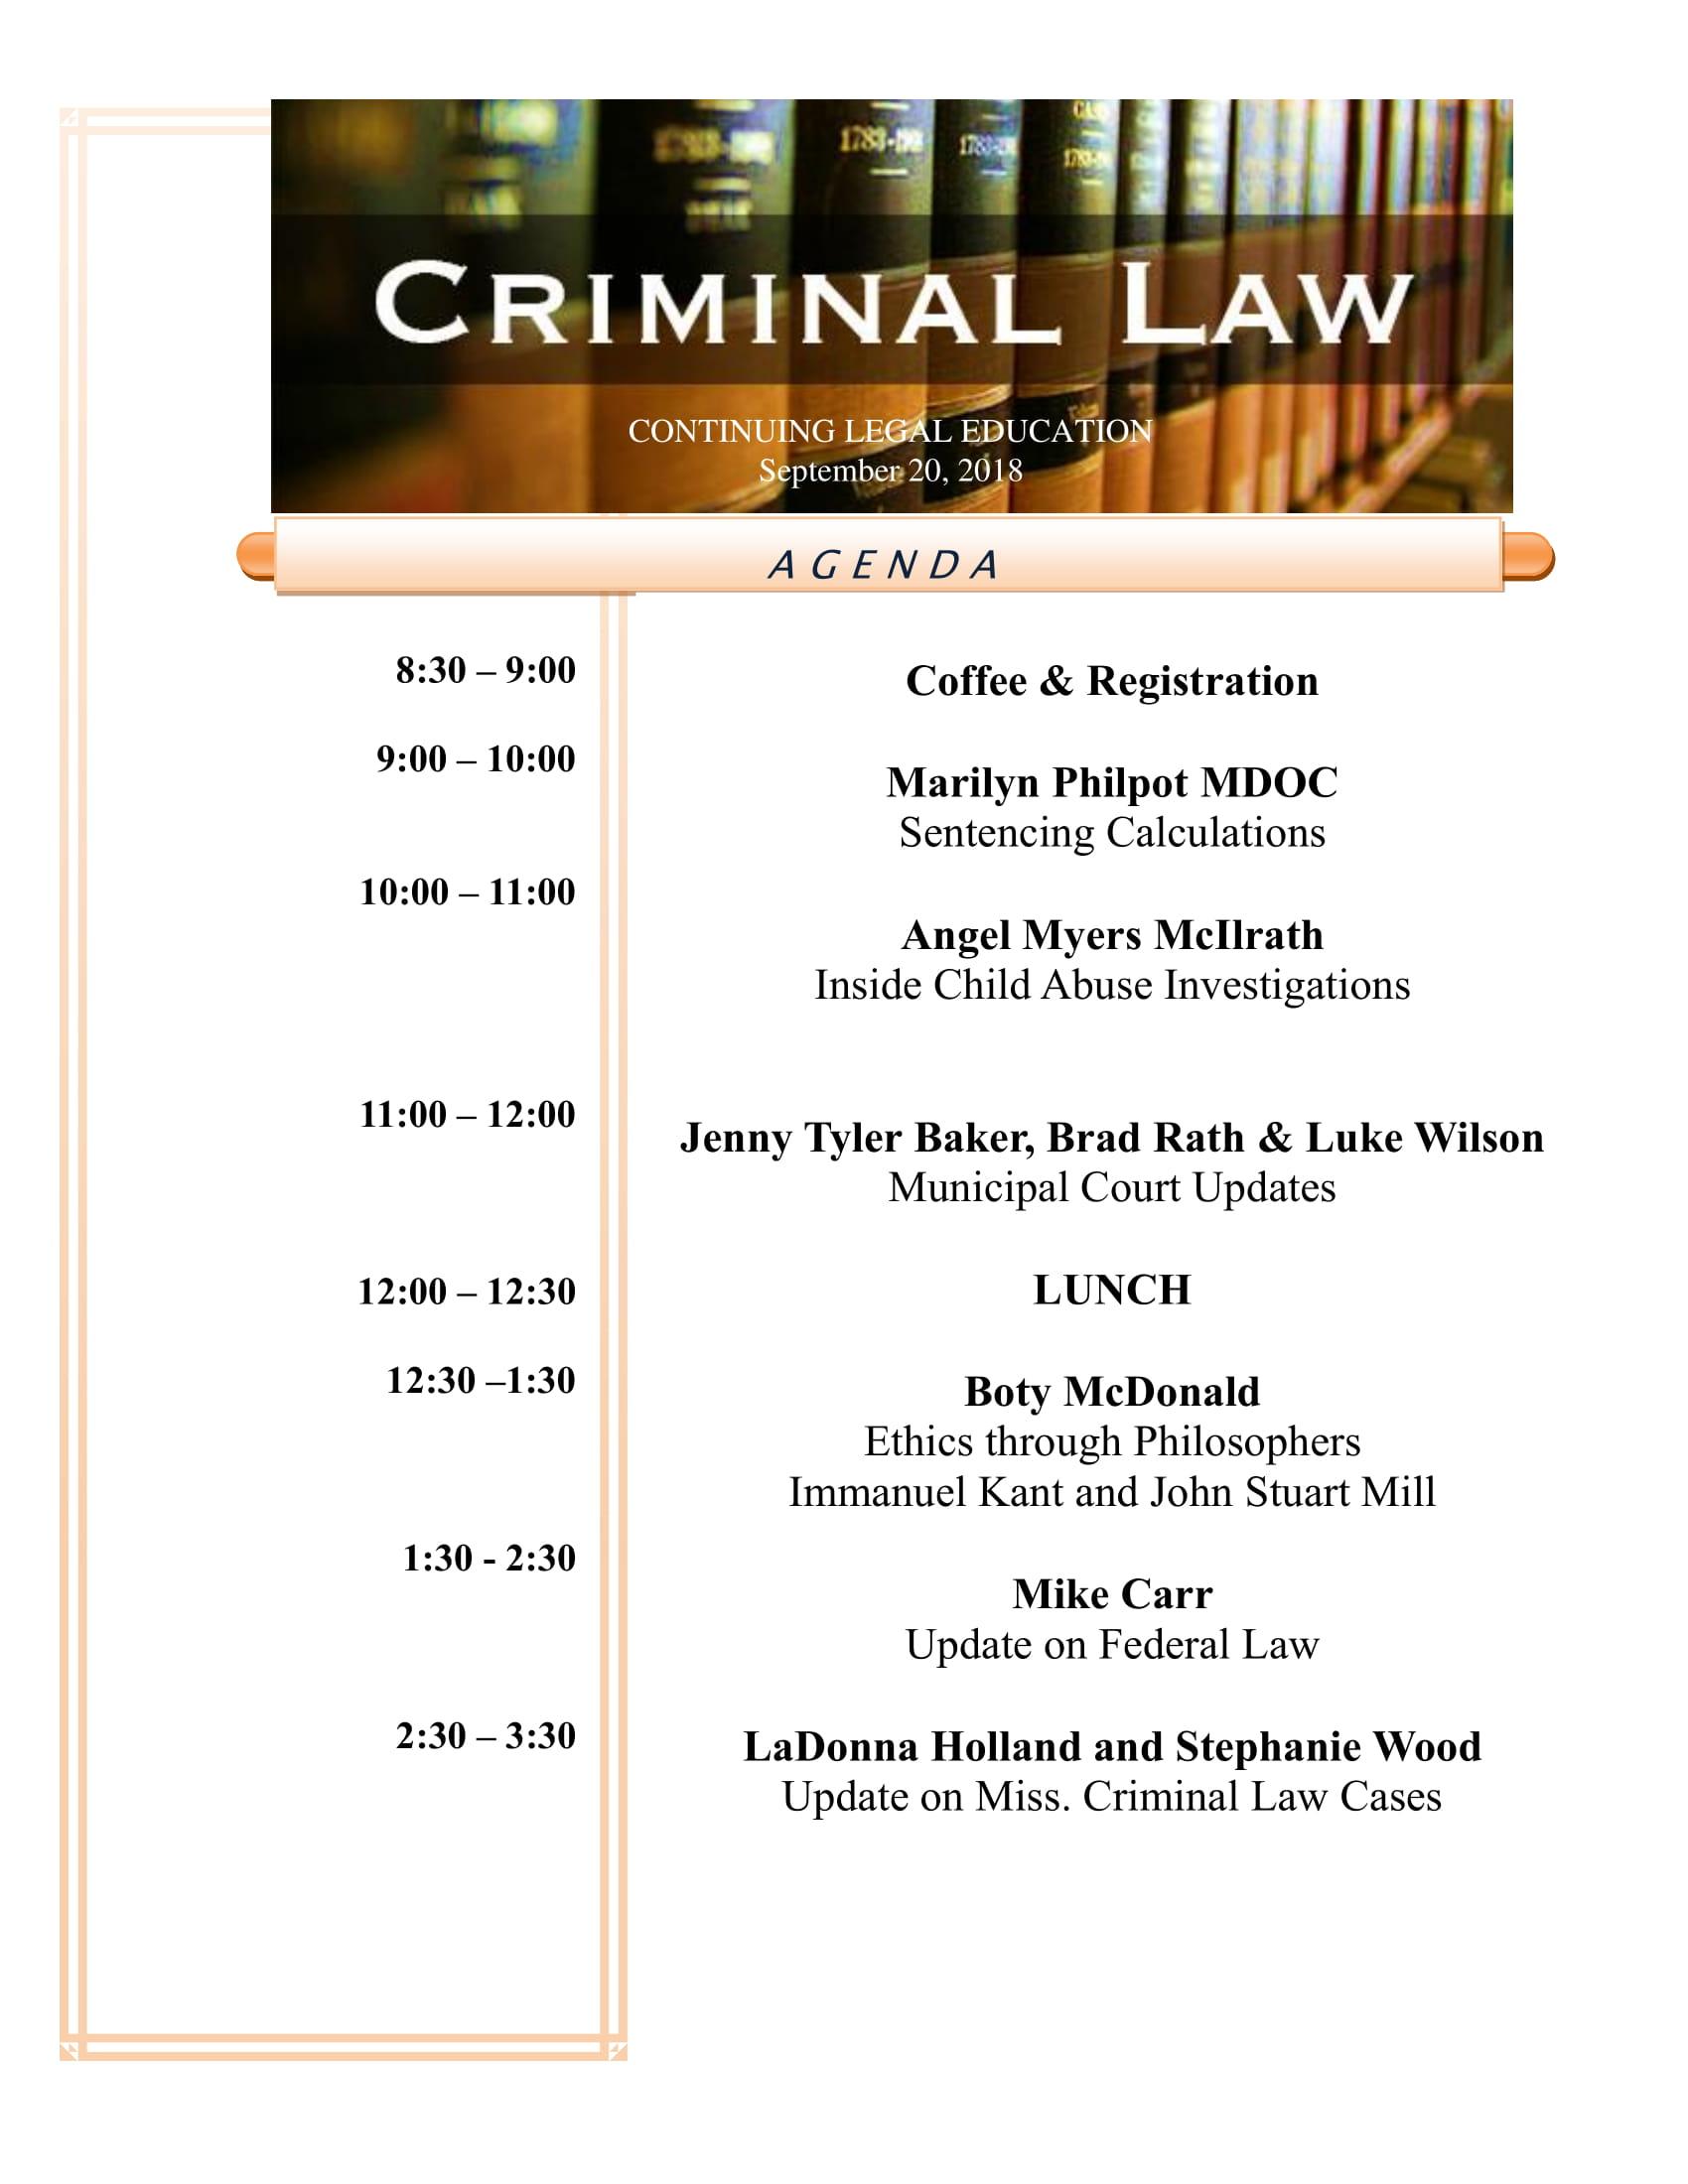 Criminal Law Agenda (1)-1.jpg